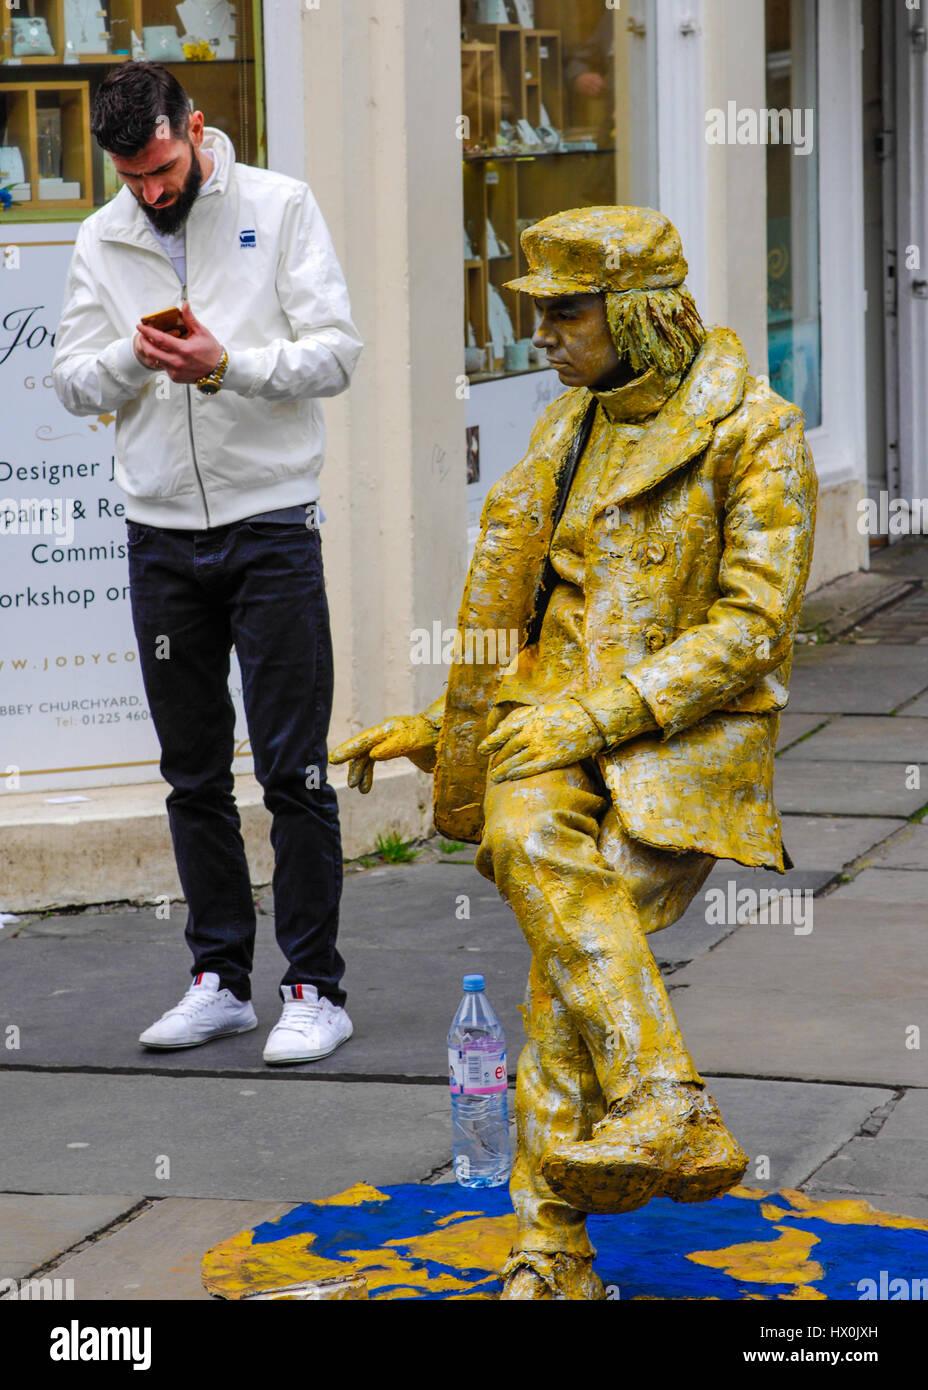 Mime street artist in Bath England UK - Stock Image